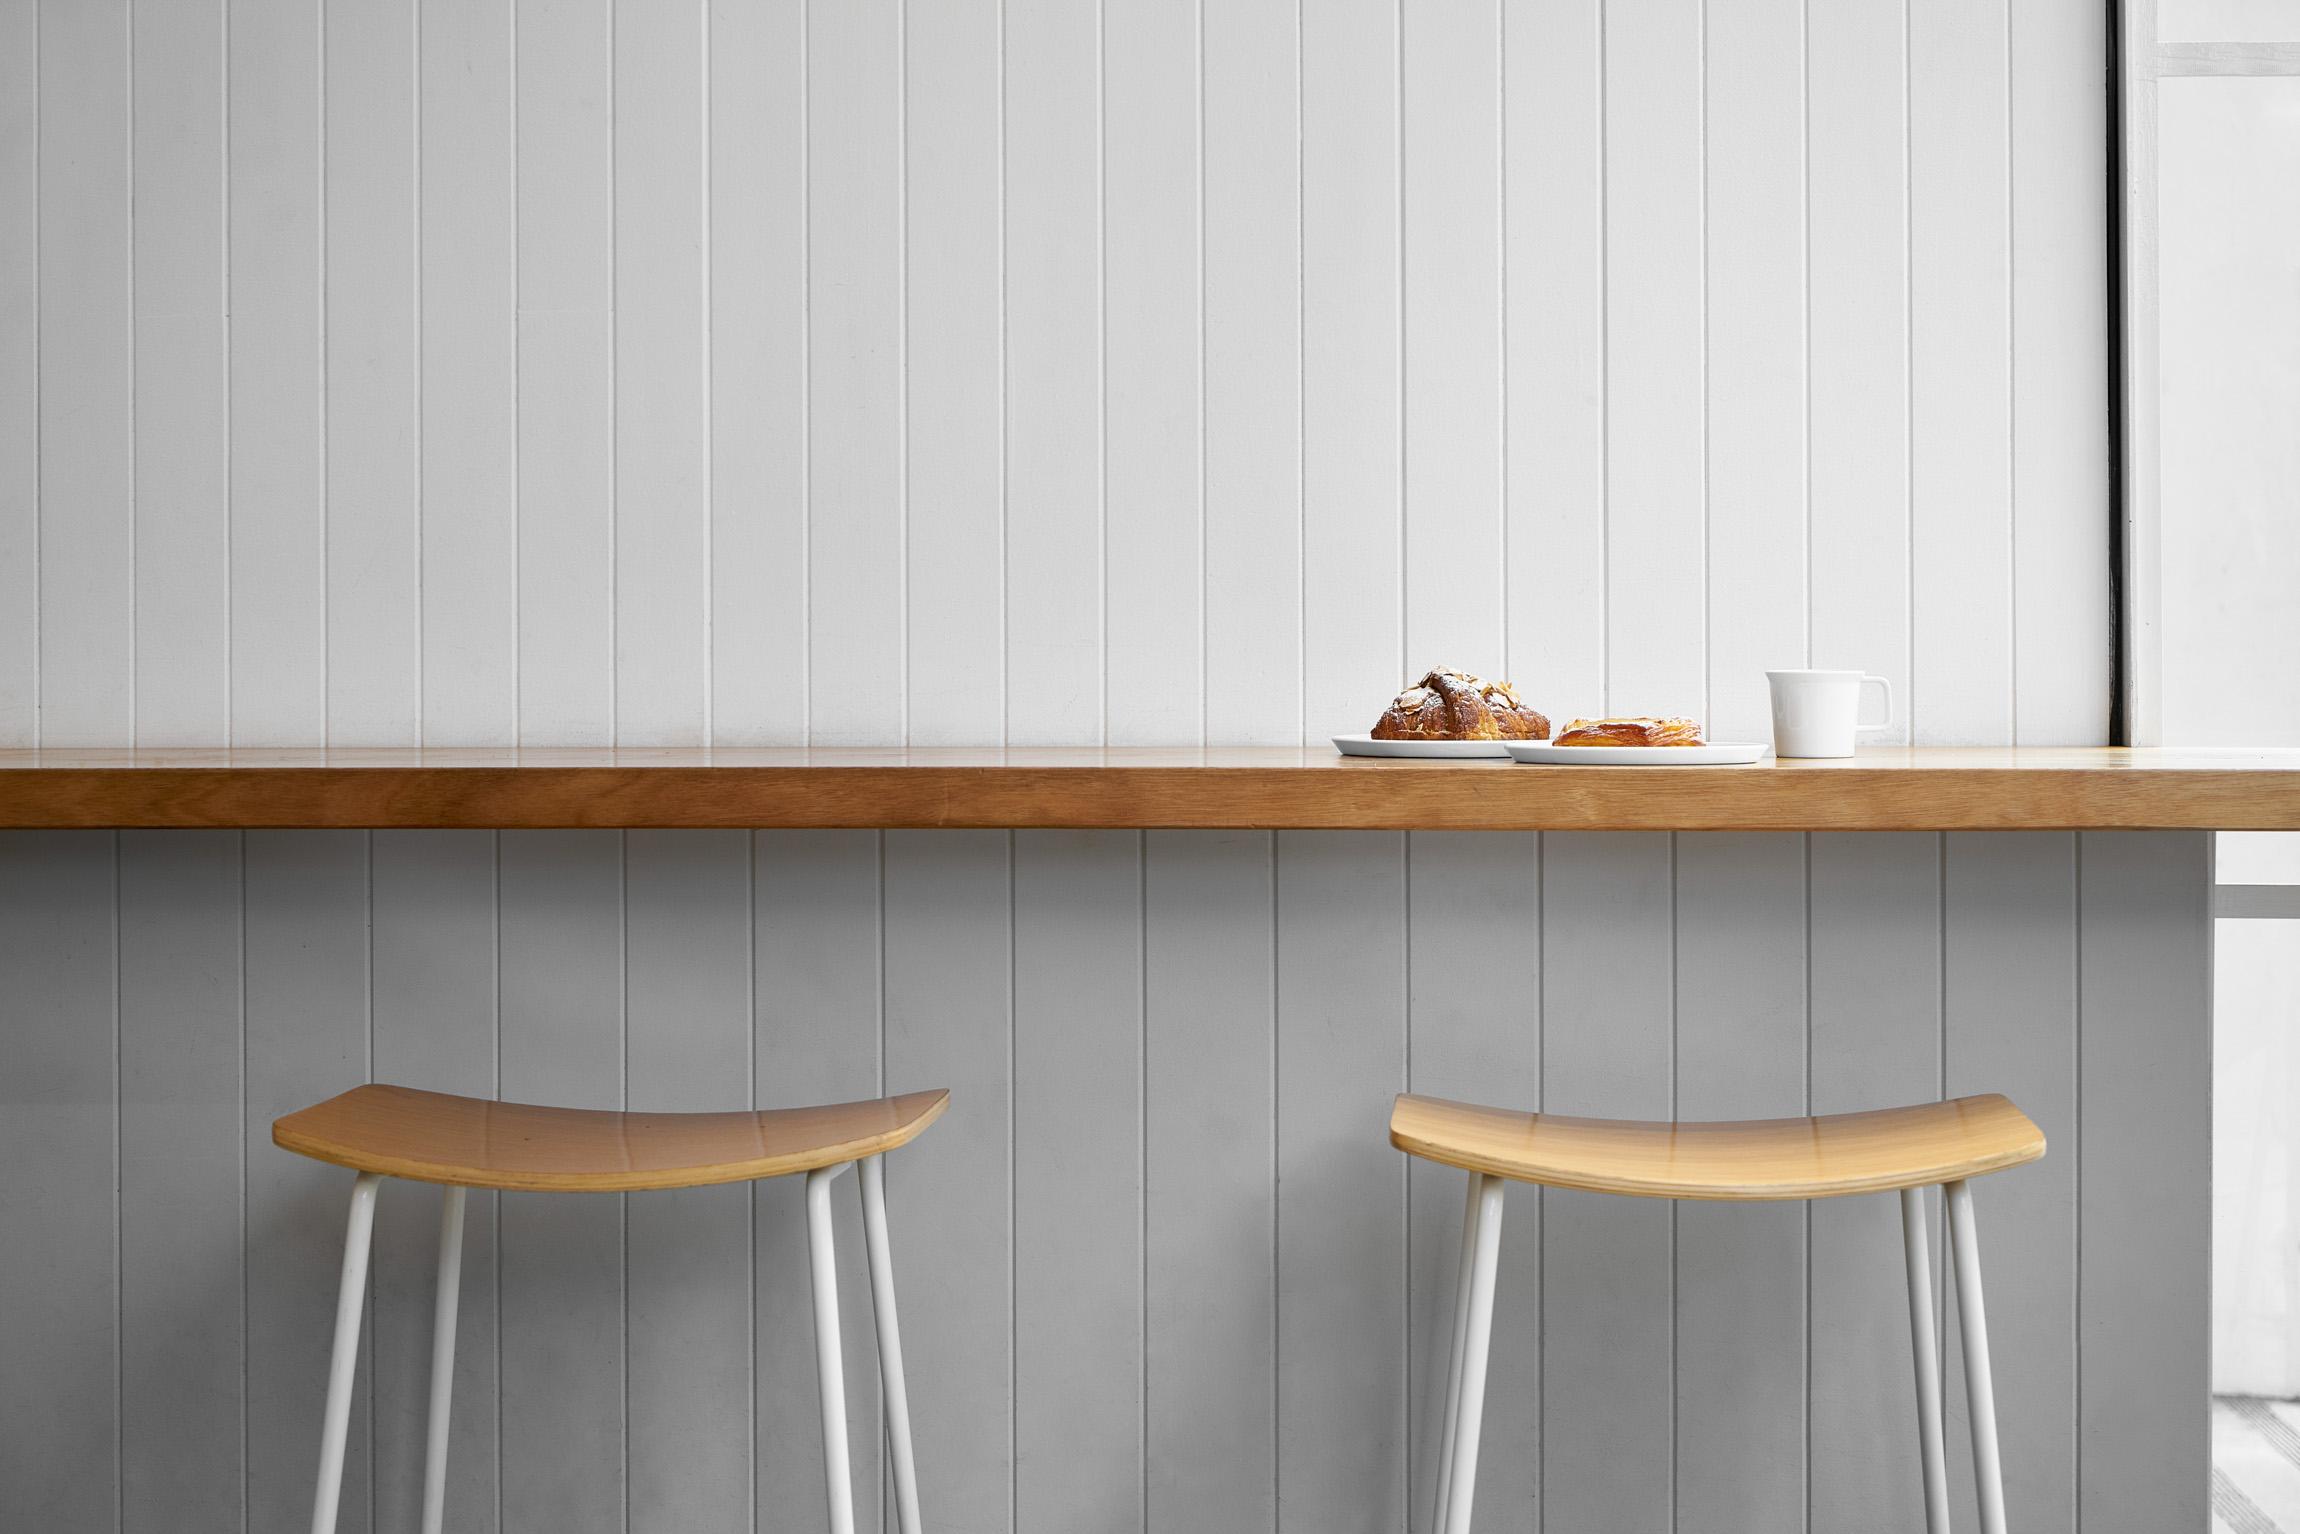 MINI Guide to Tasmania — Pigeon Whole Bakers